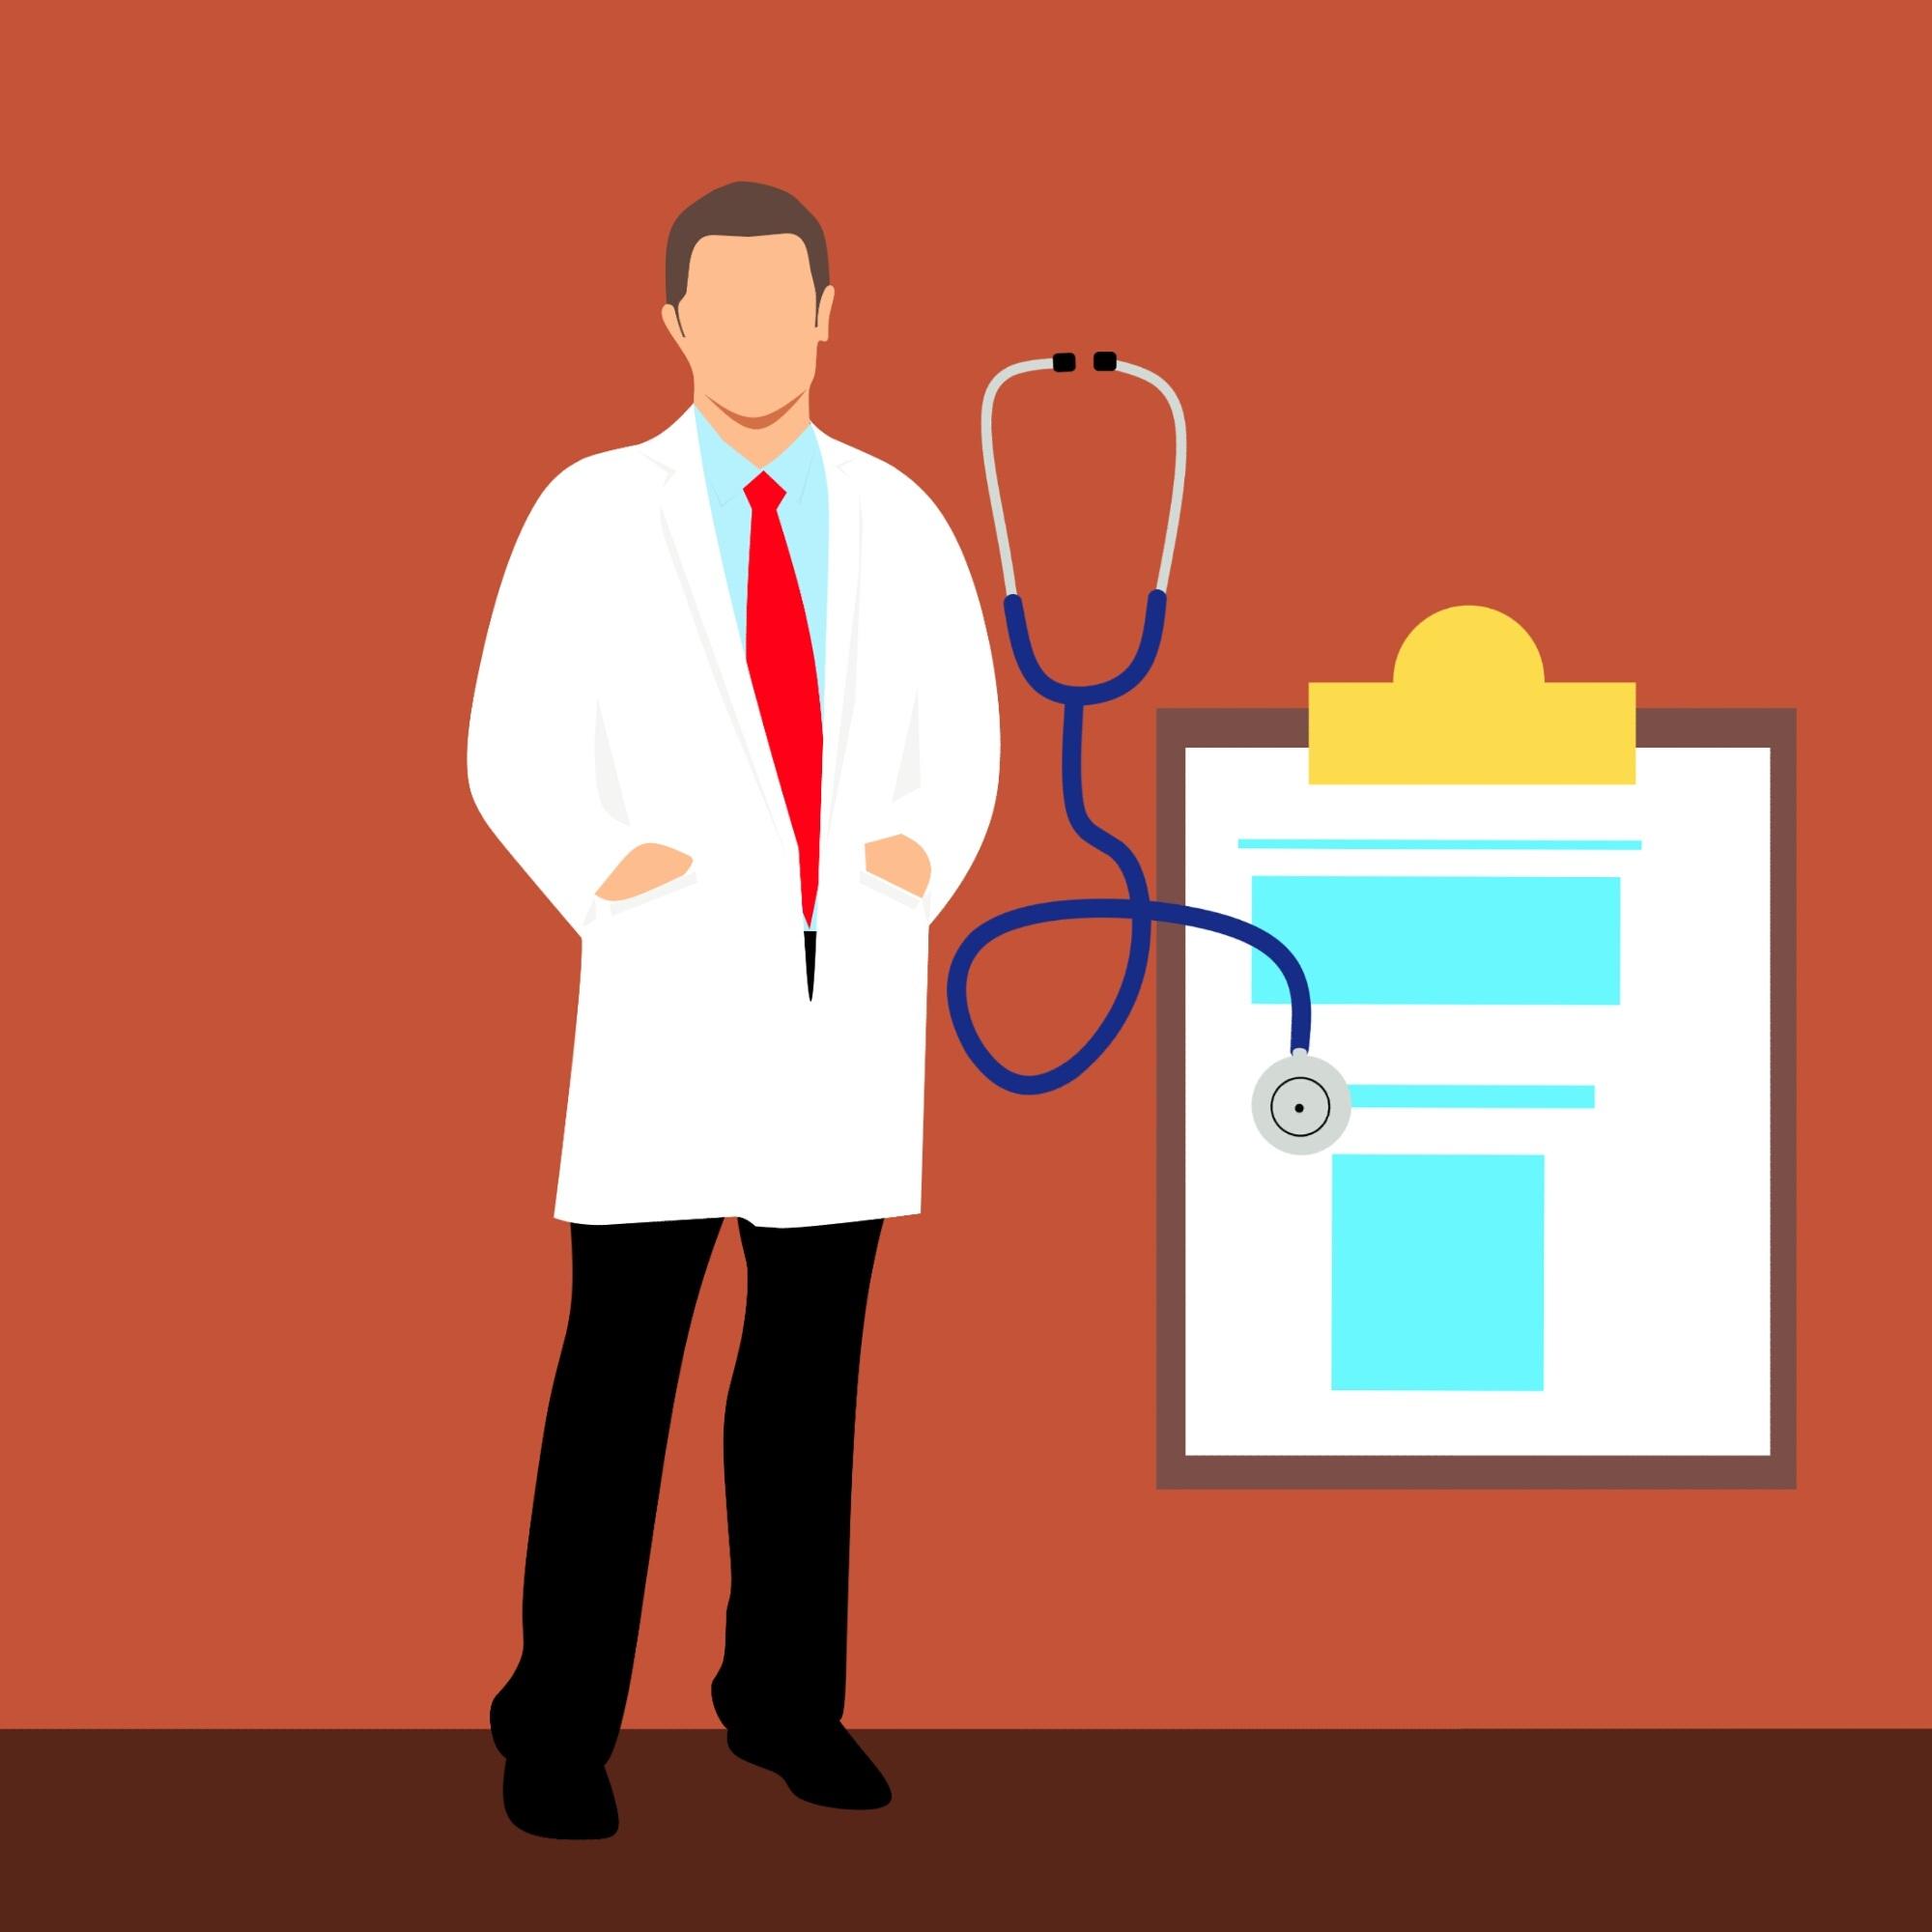 Fotos Gratis Doctor Chequeo Salud Dibujos Animados